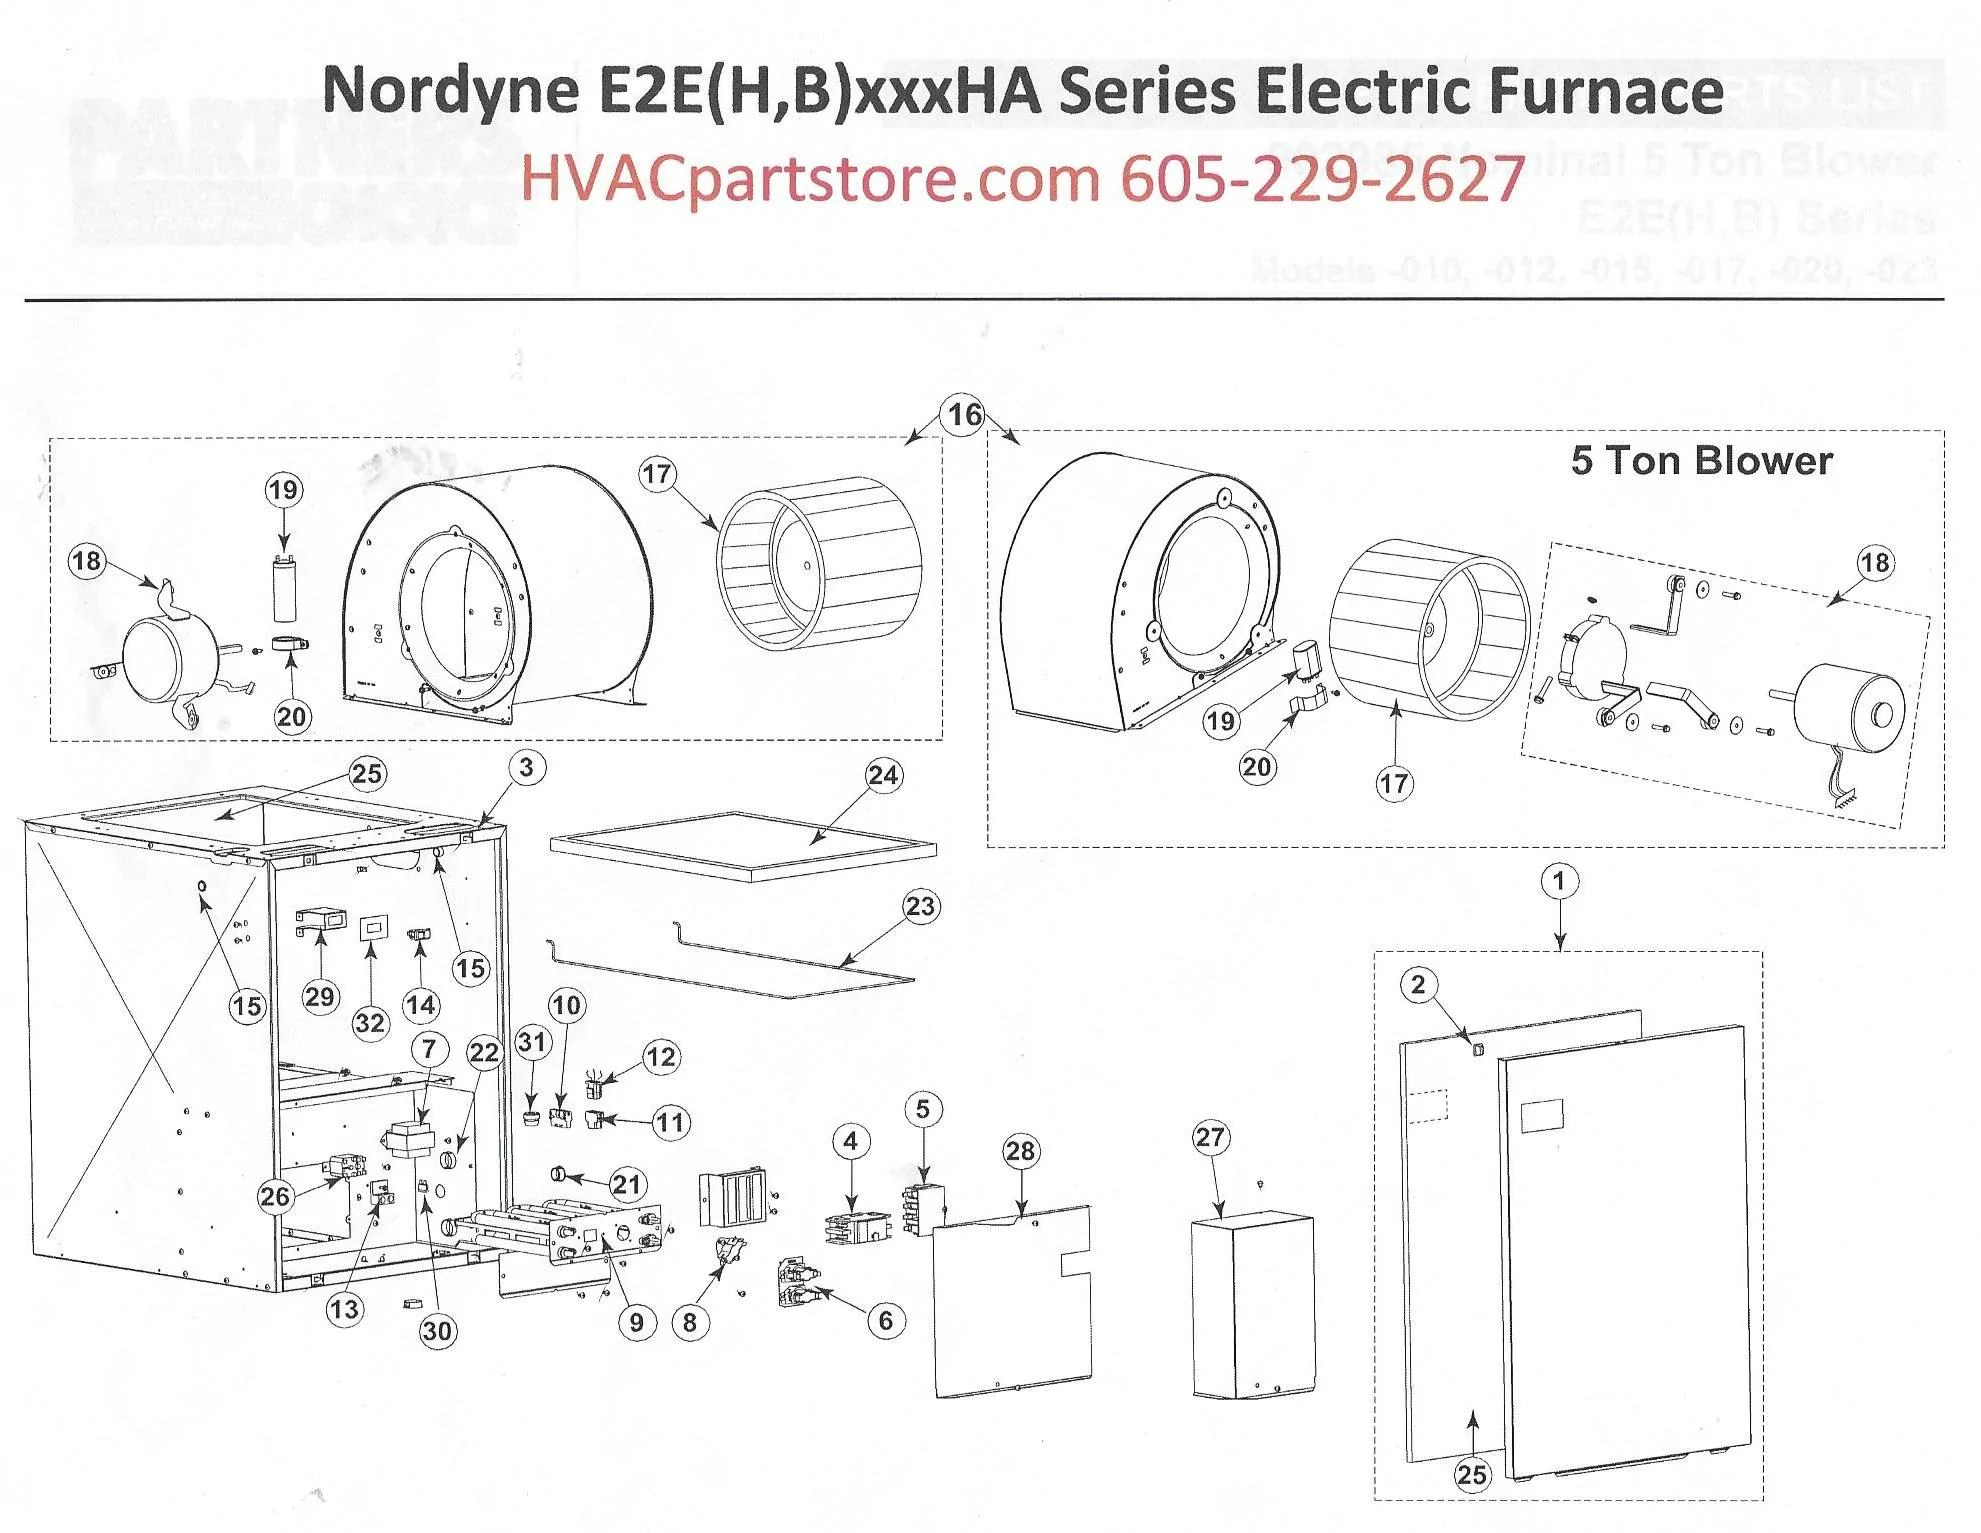 E2EB017HA Nordyne Electric Furnace Parts – HVACpartstore